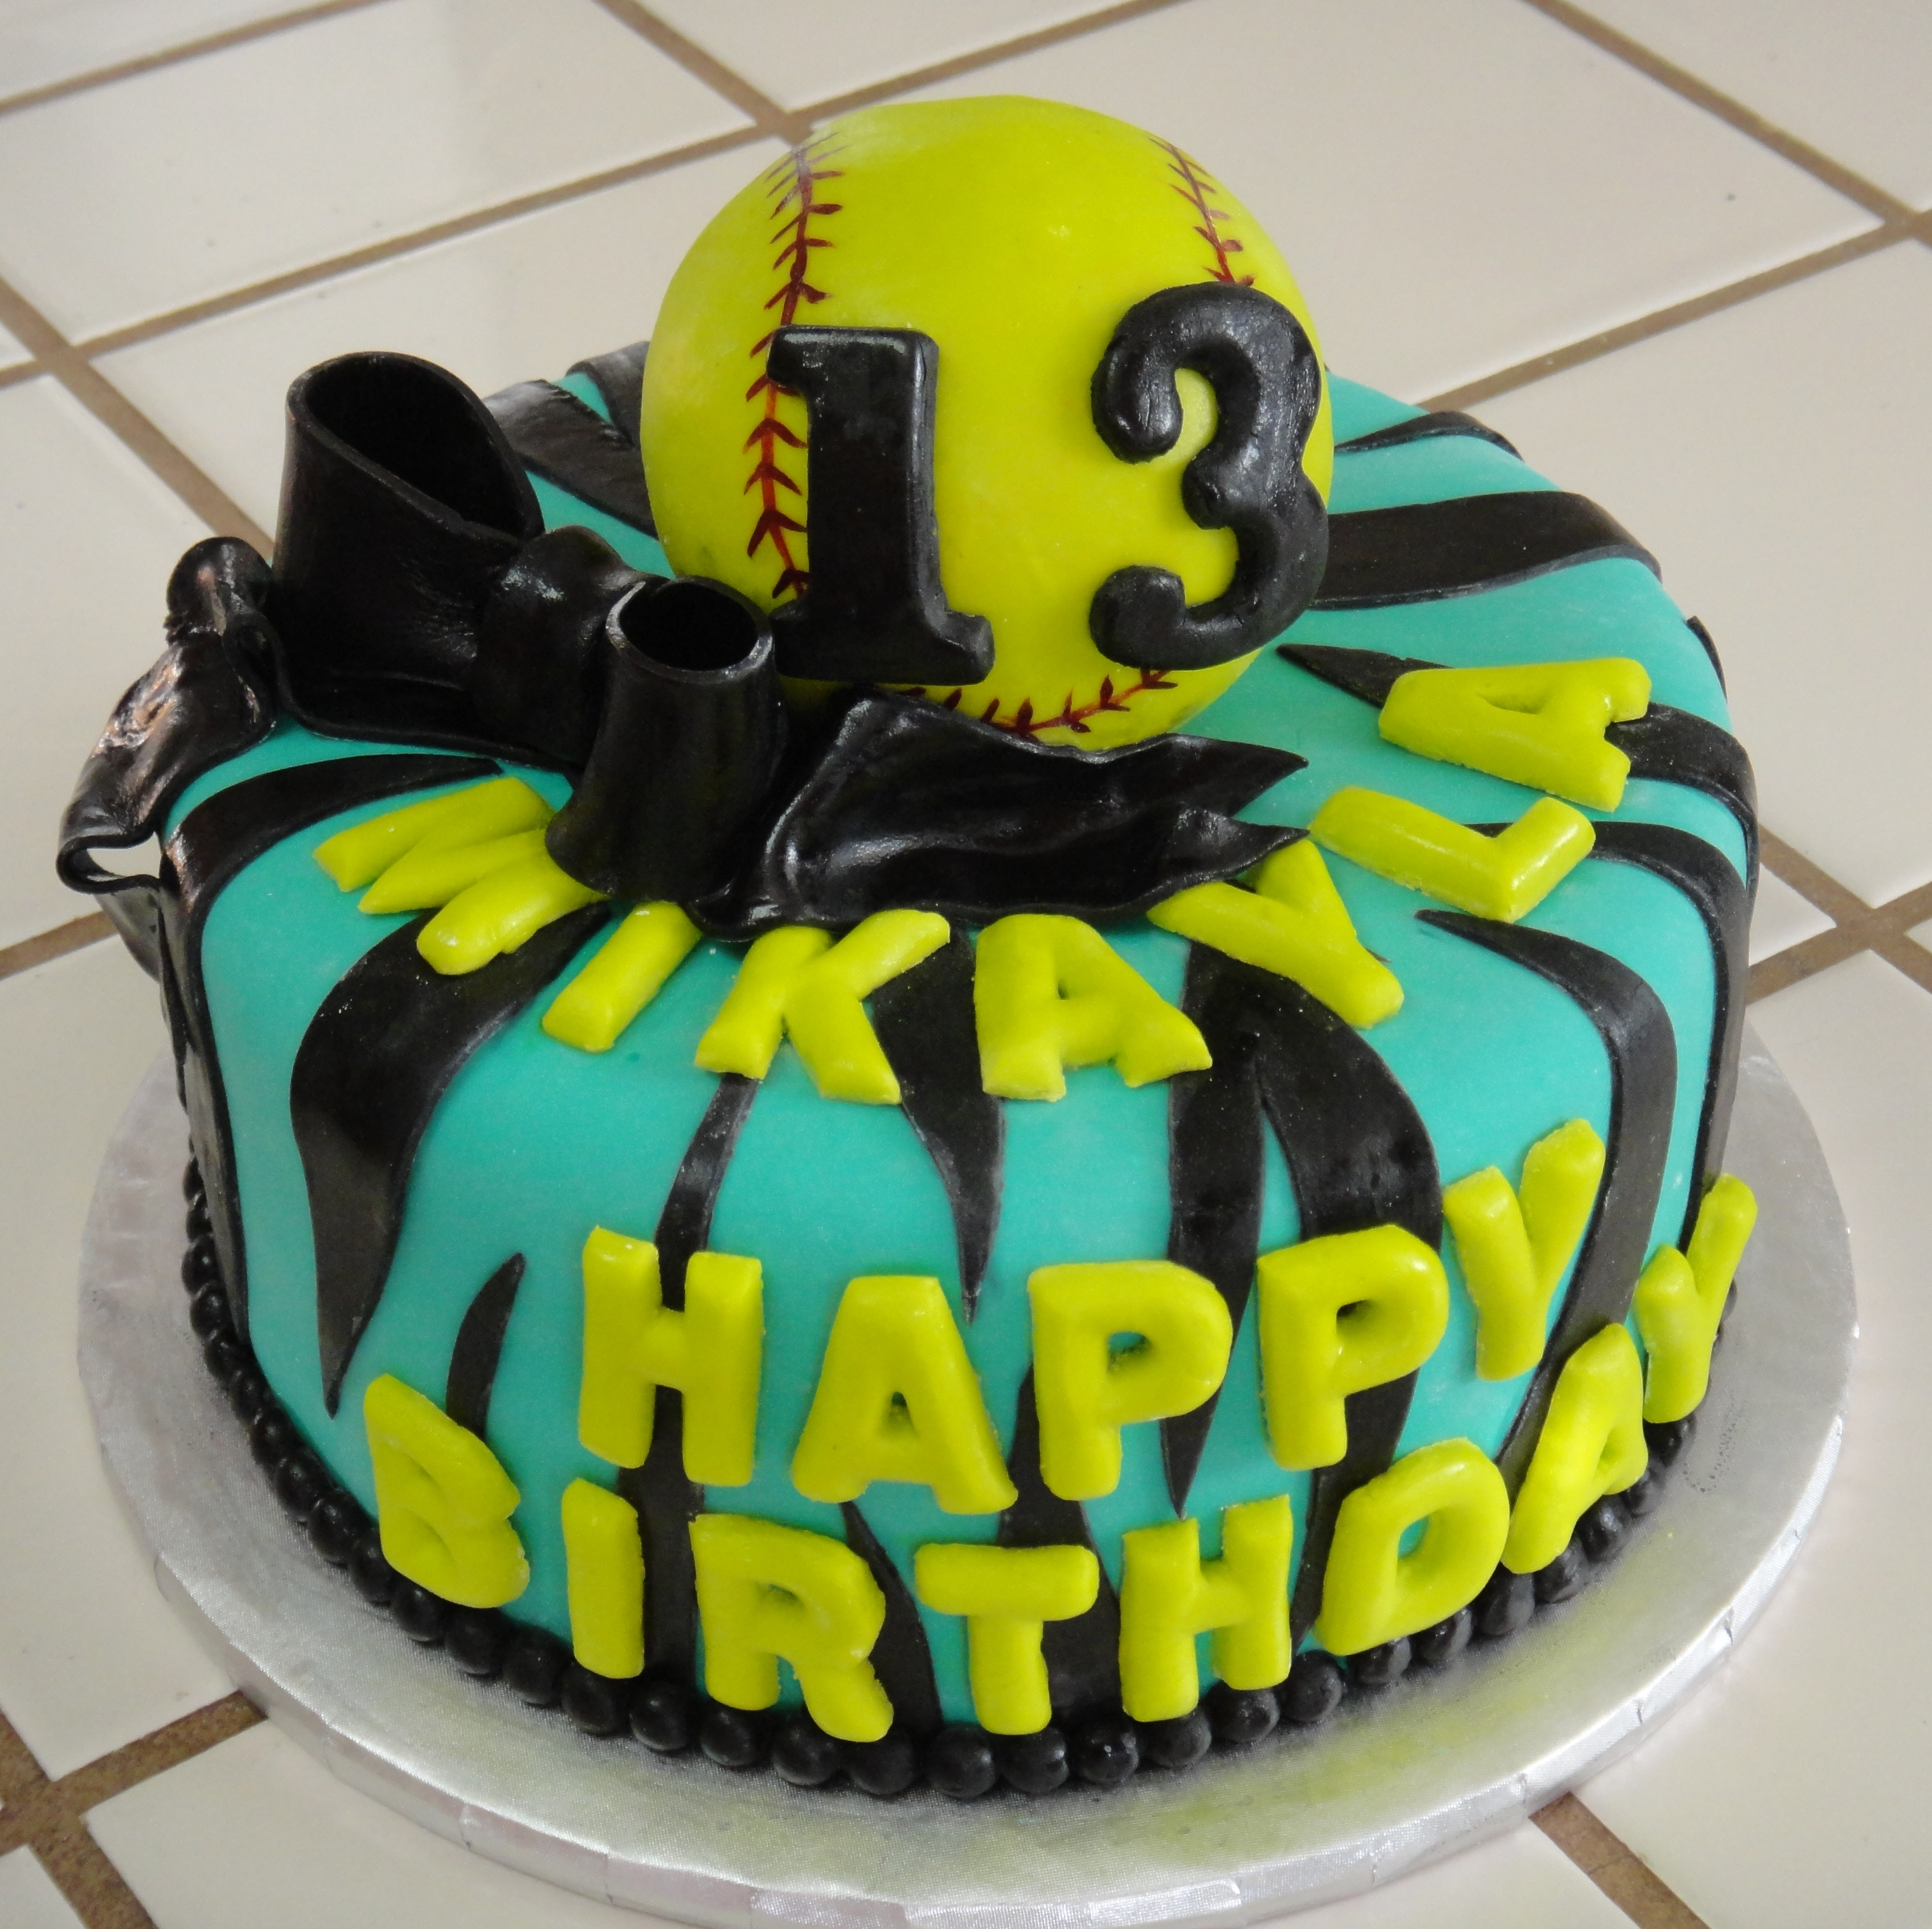 12 Softball Themed Cakes For Girls Photo Softball Birthday Cake